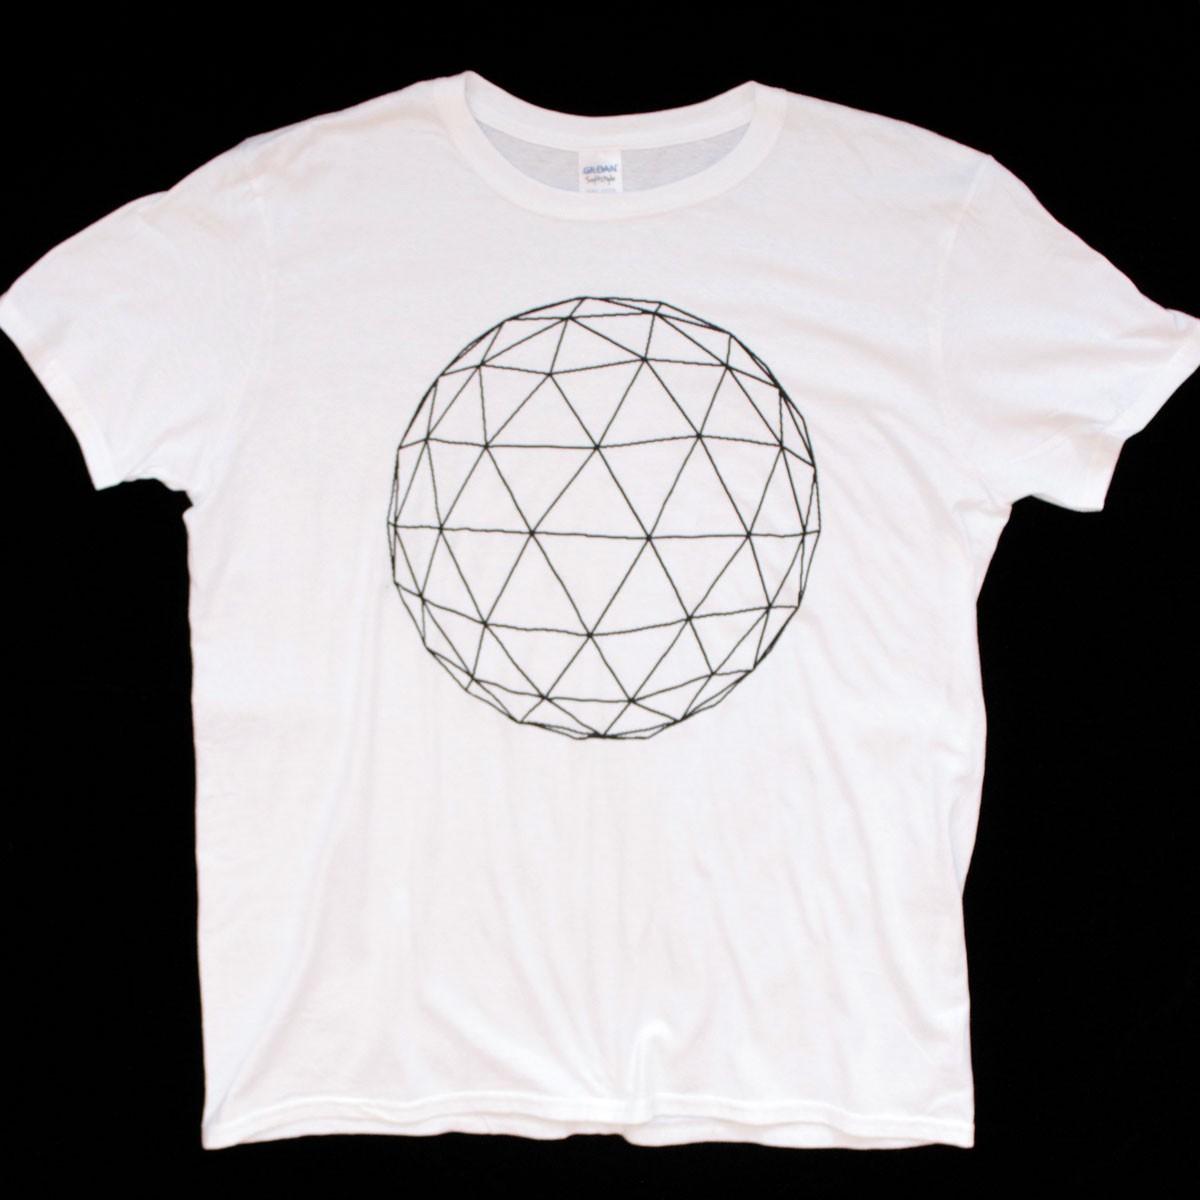 lee_wagstaff_tshirt_sphere_b